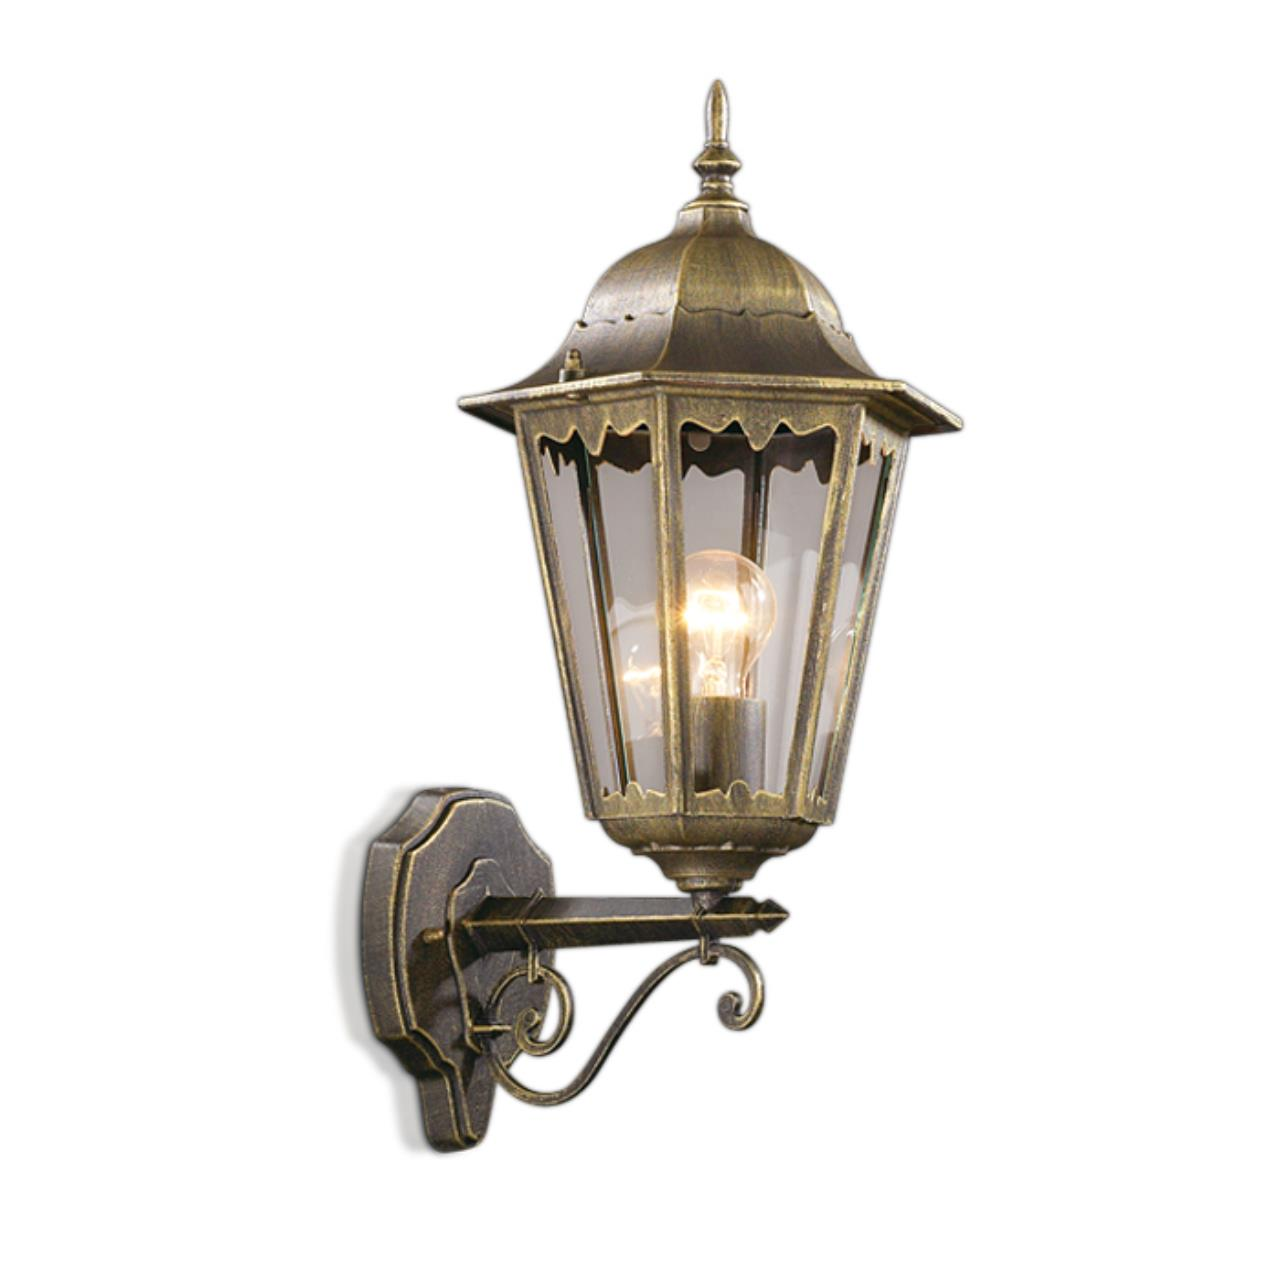 2319/1W NATURE ODL12 719 бронза Уличный настен светильник IP44 E27 60W 220V LANO